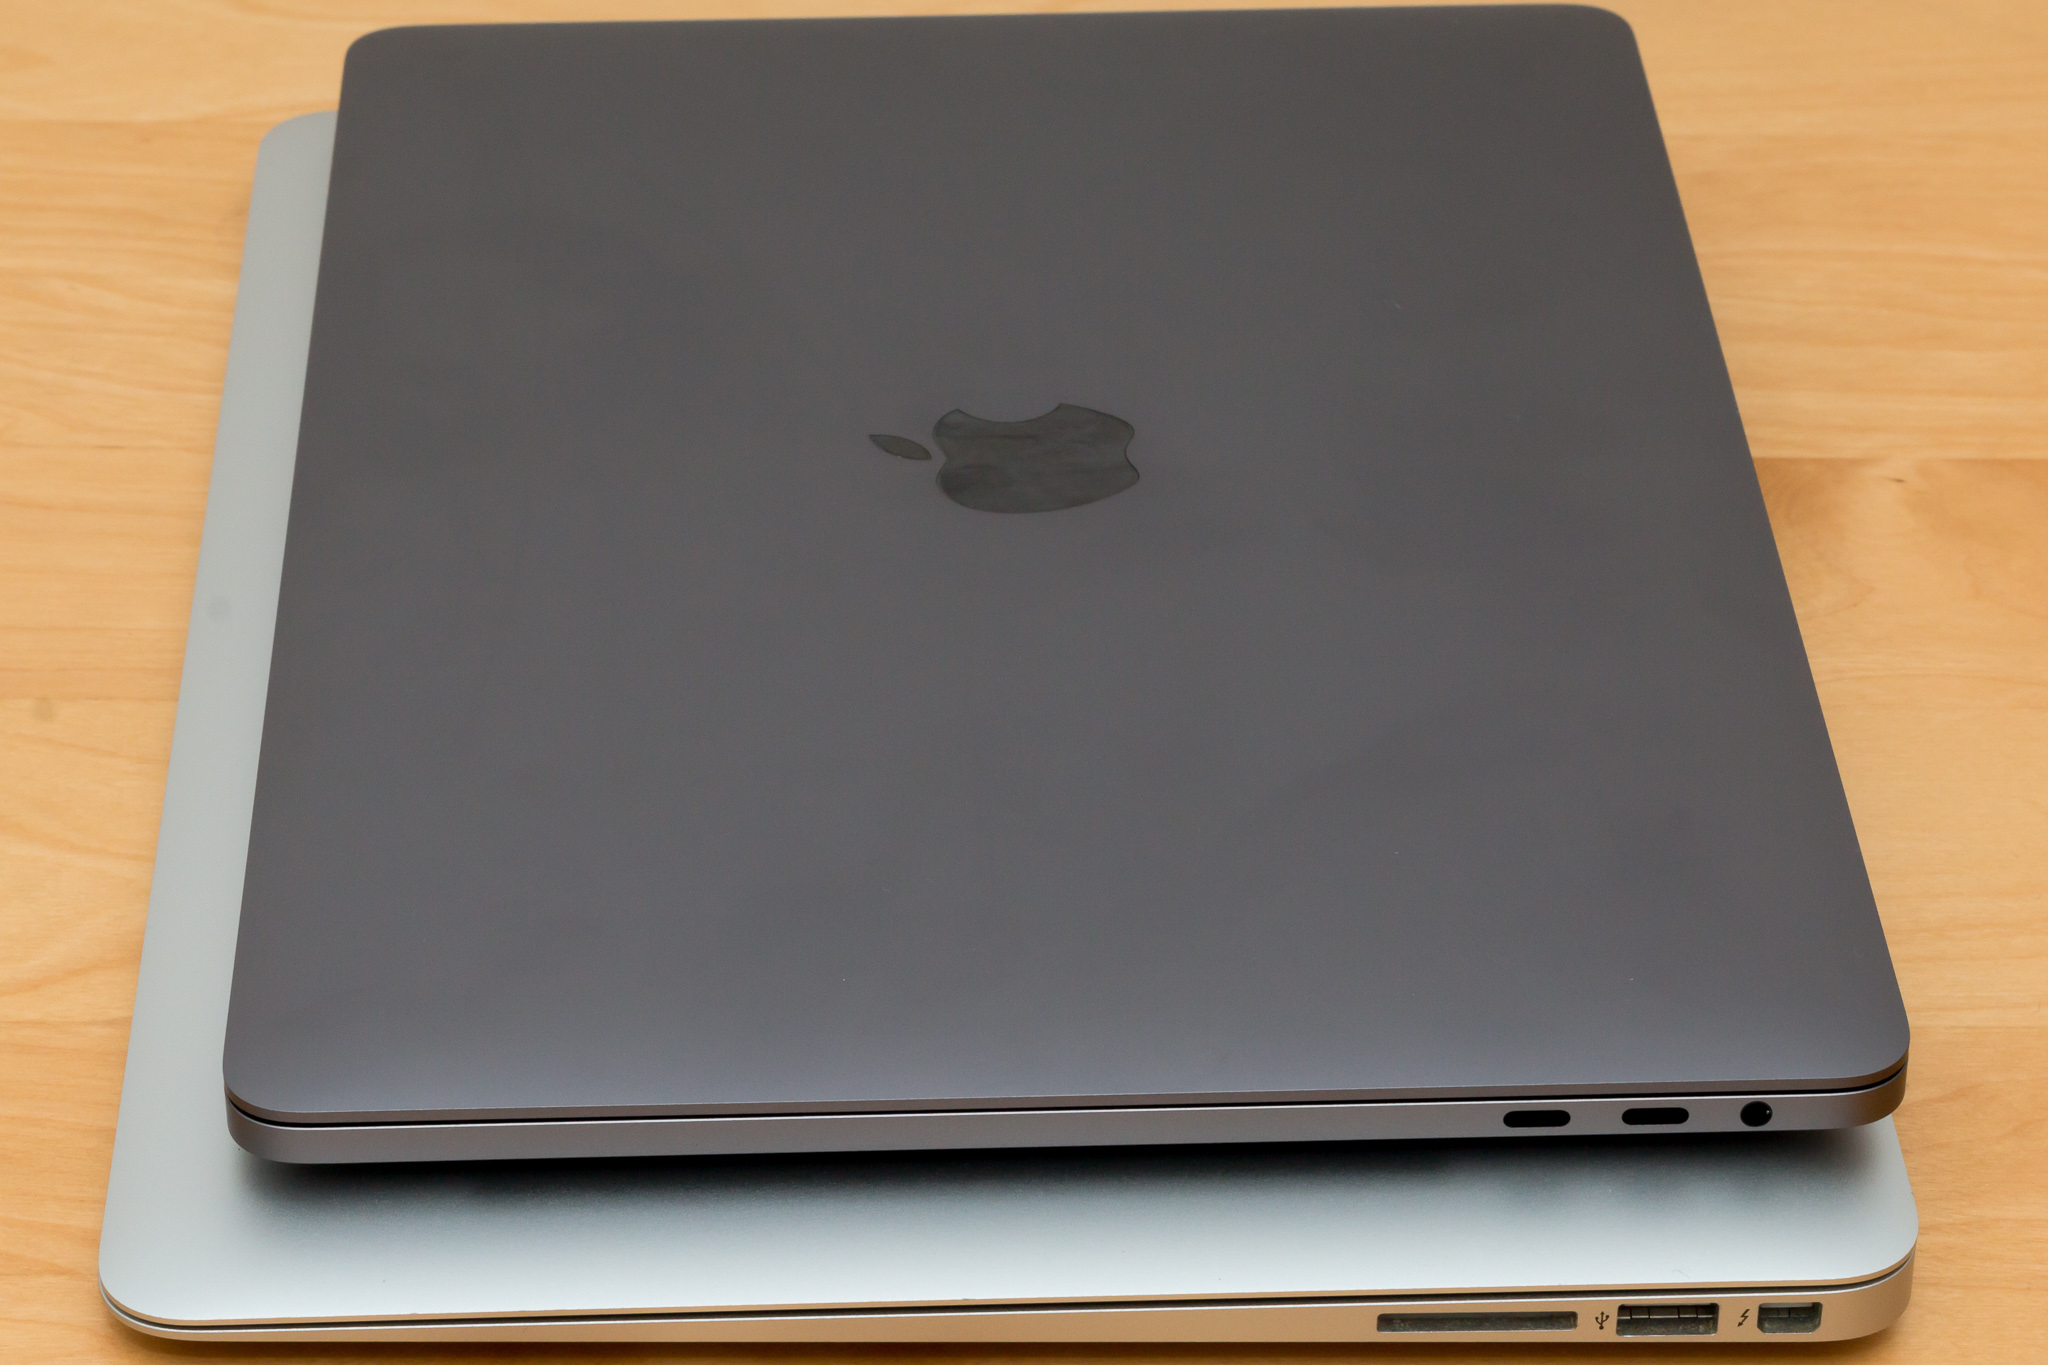 apple macbook pro 2016 vs macbook air 2012 tech. Black Bedroom Furniture Sets. Home Design Ideas